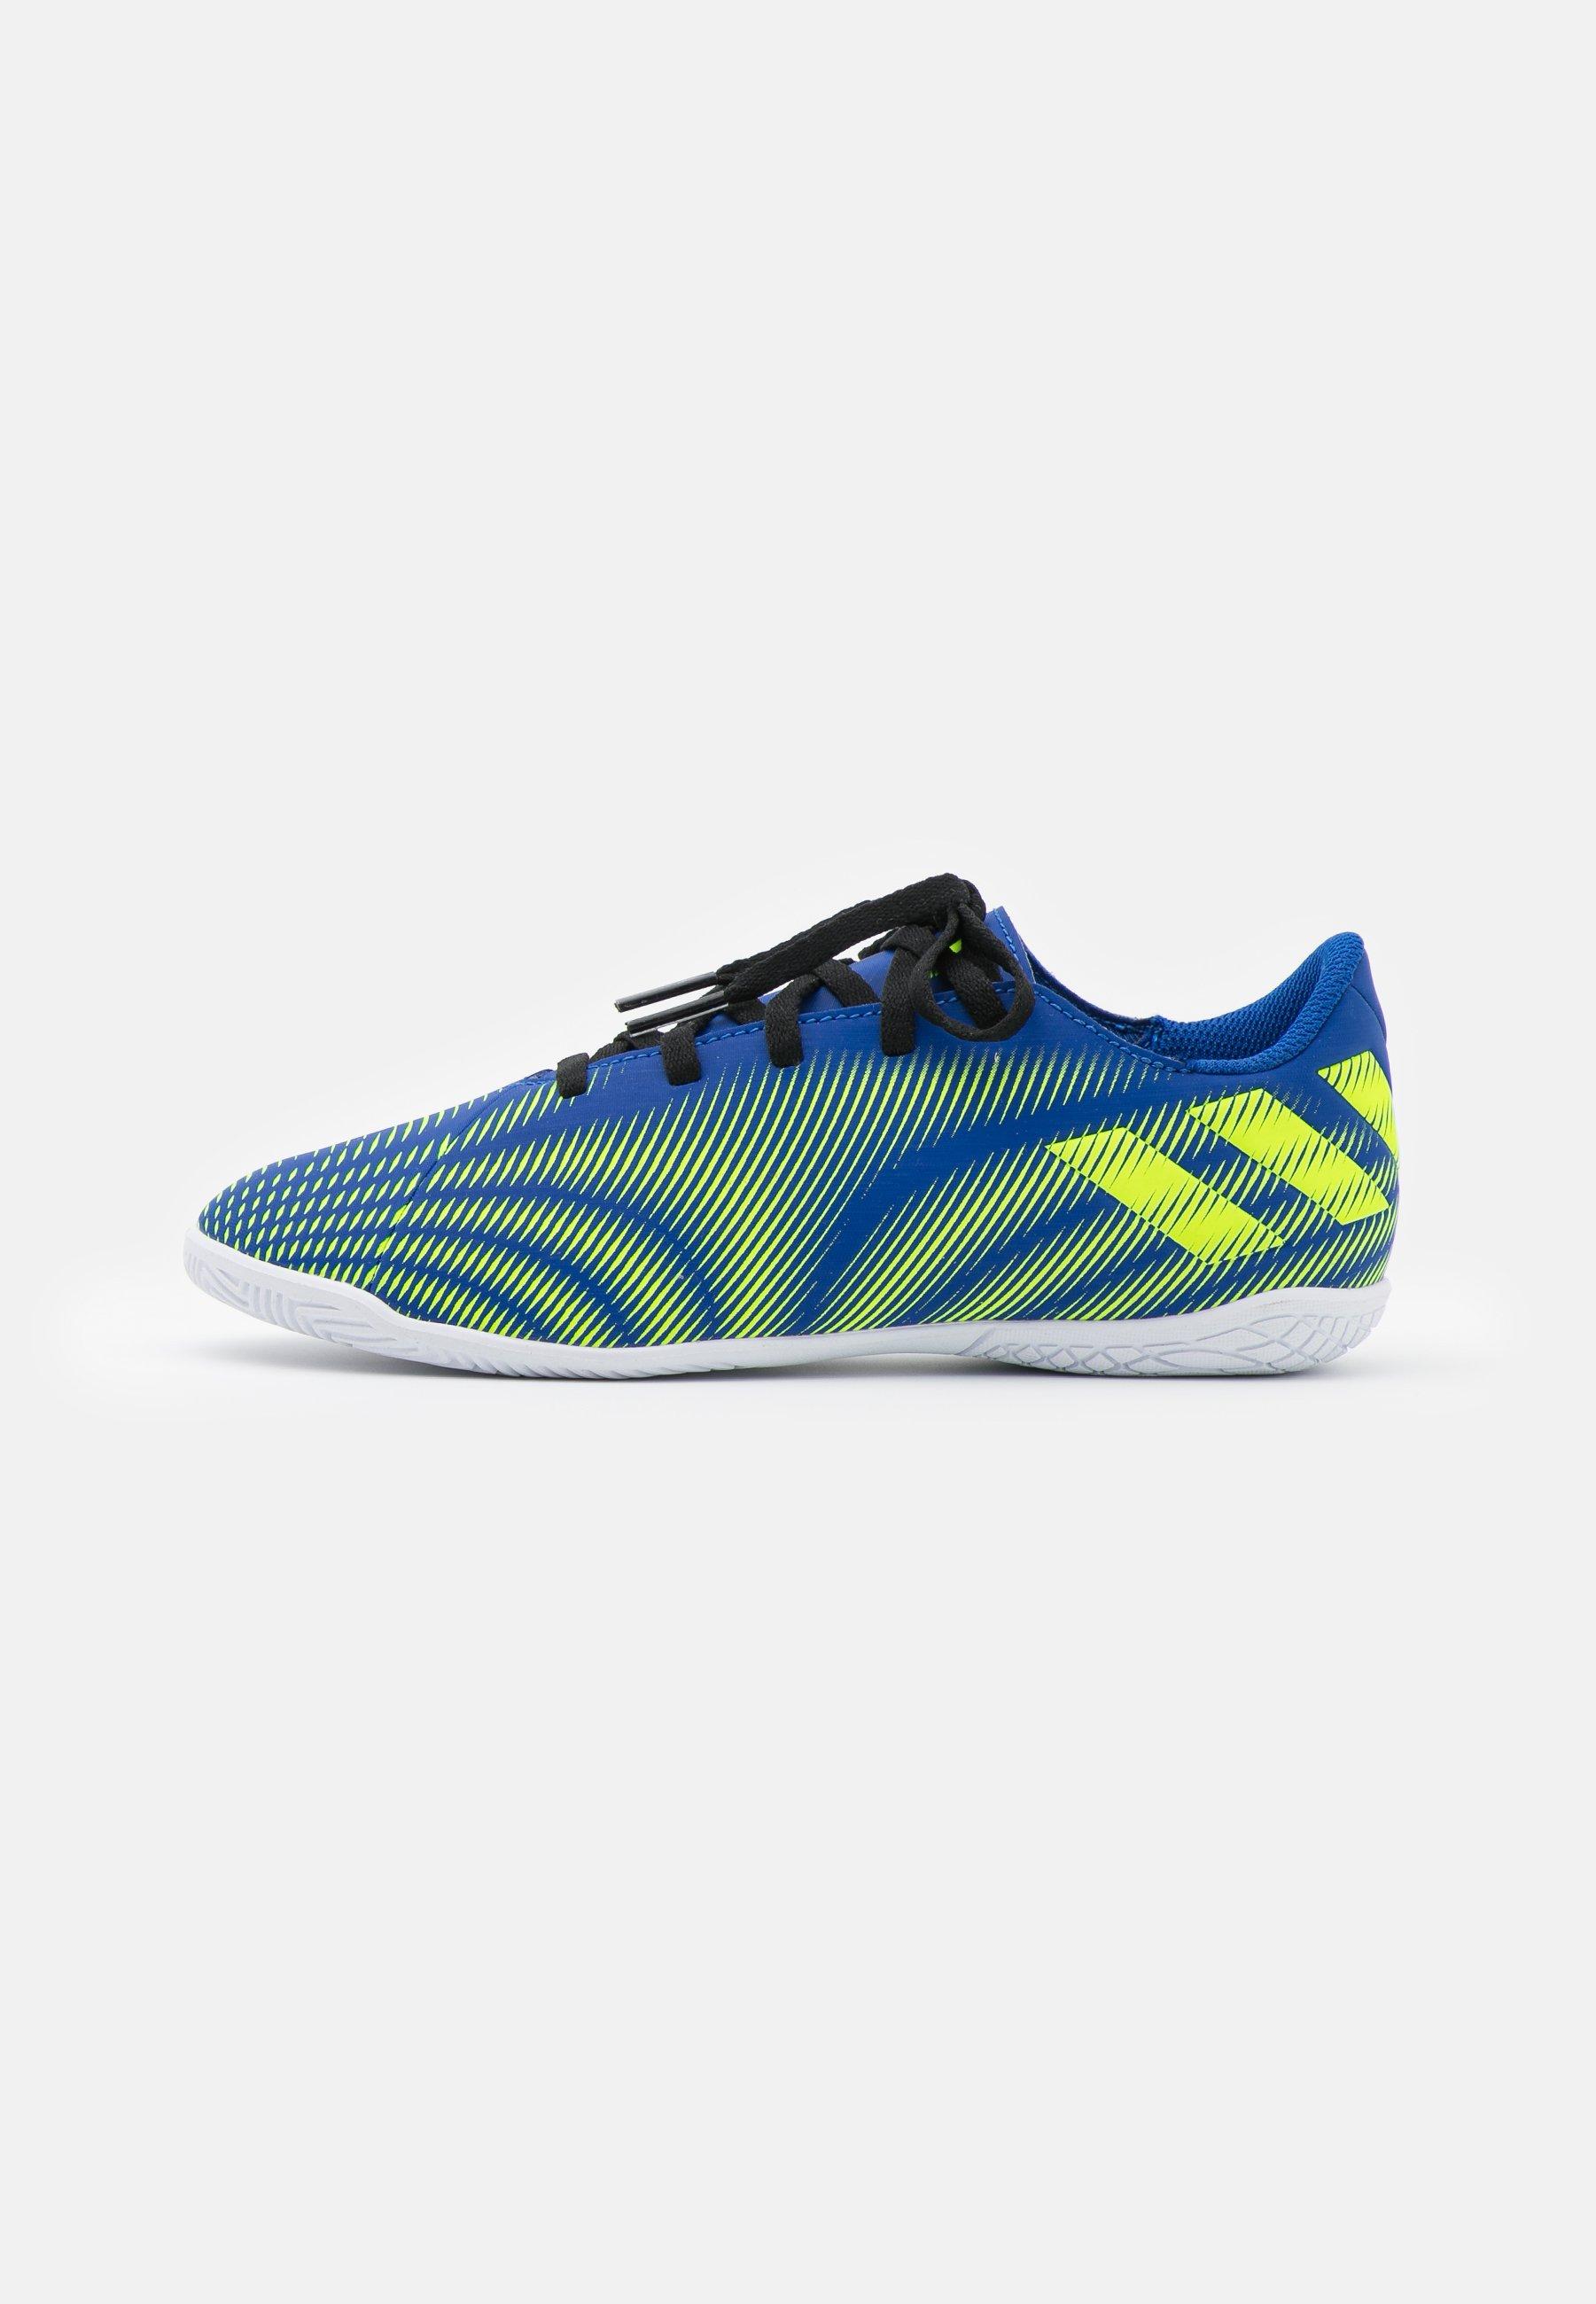 Kids NEMEZIZ .4 IN UNISEX - Indoor football boots - royal blue/solar yellow/footwear white